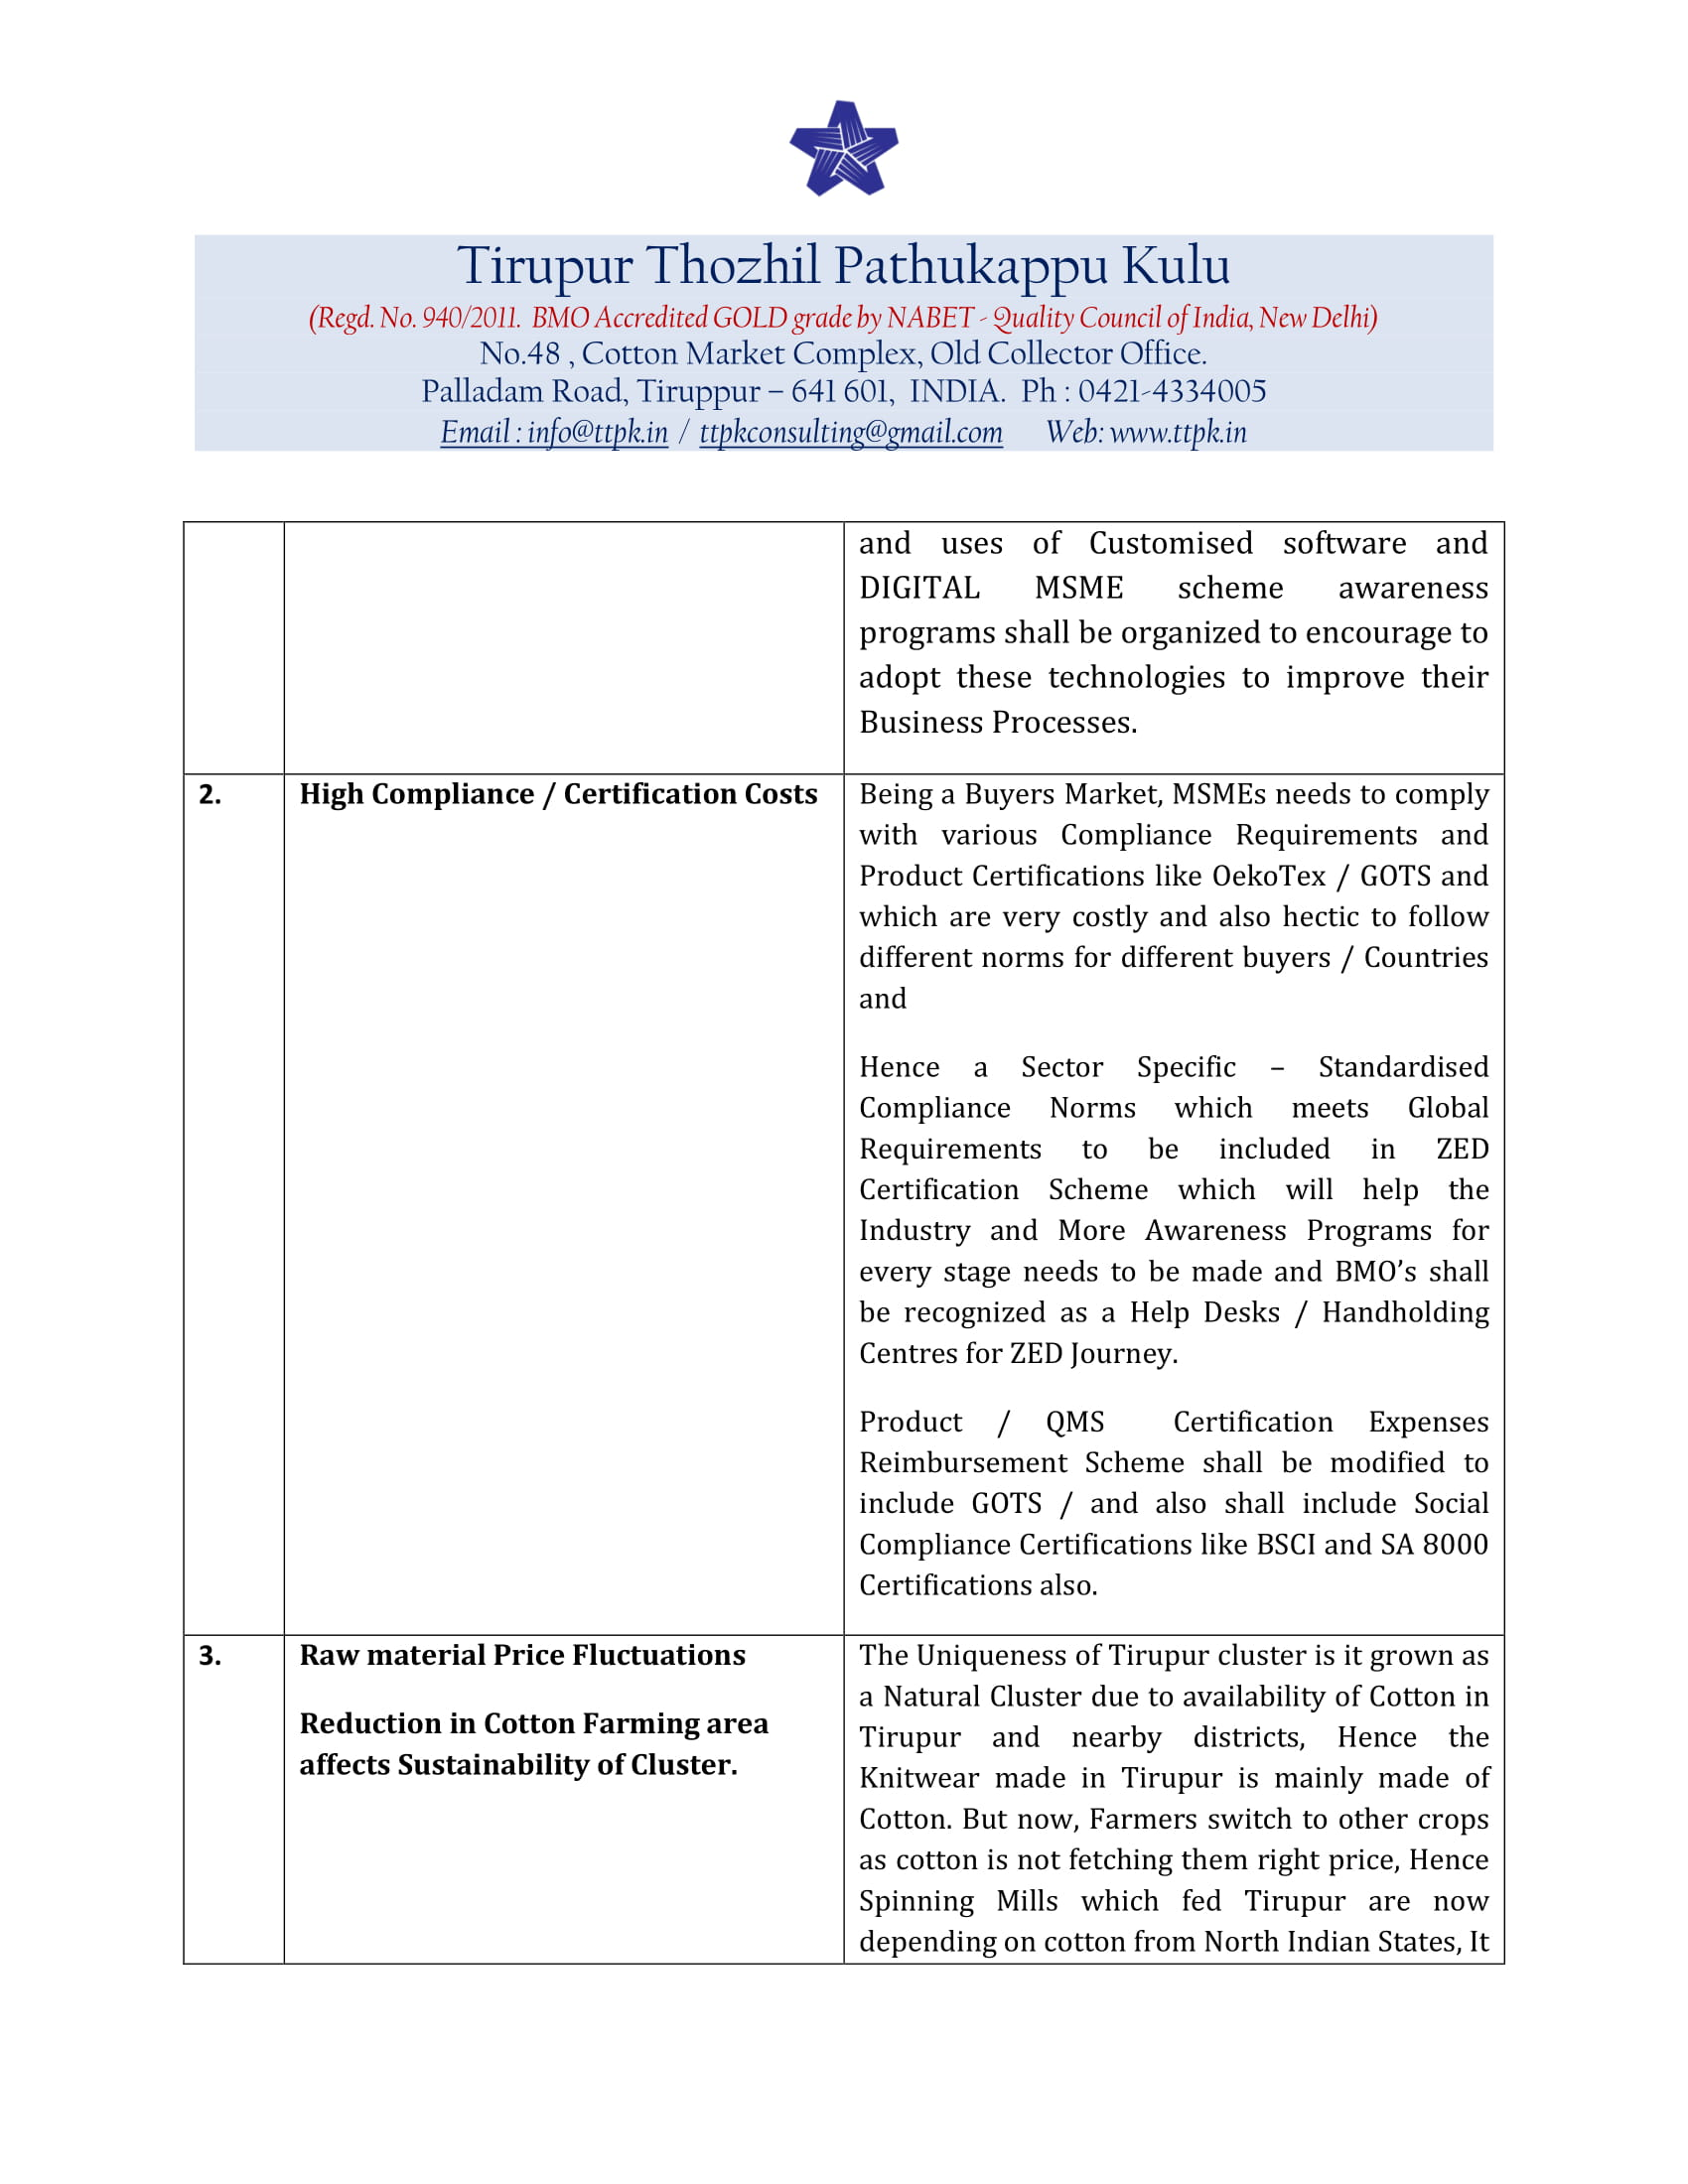 Tirupur 5 Sthesh Kumar